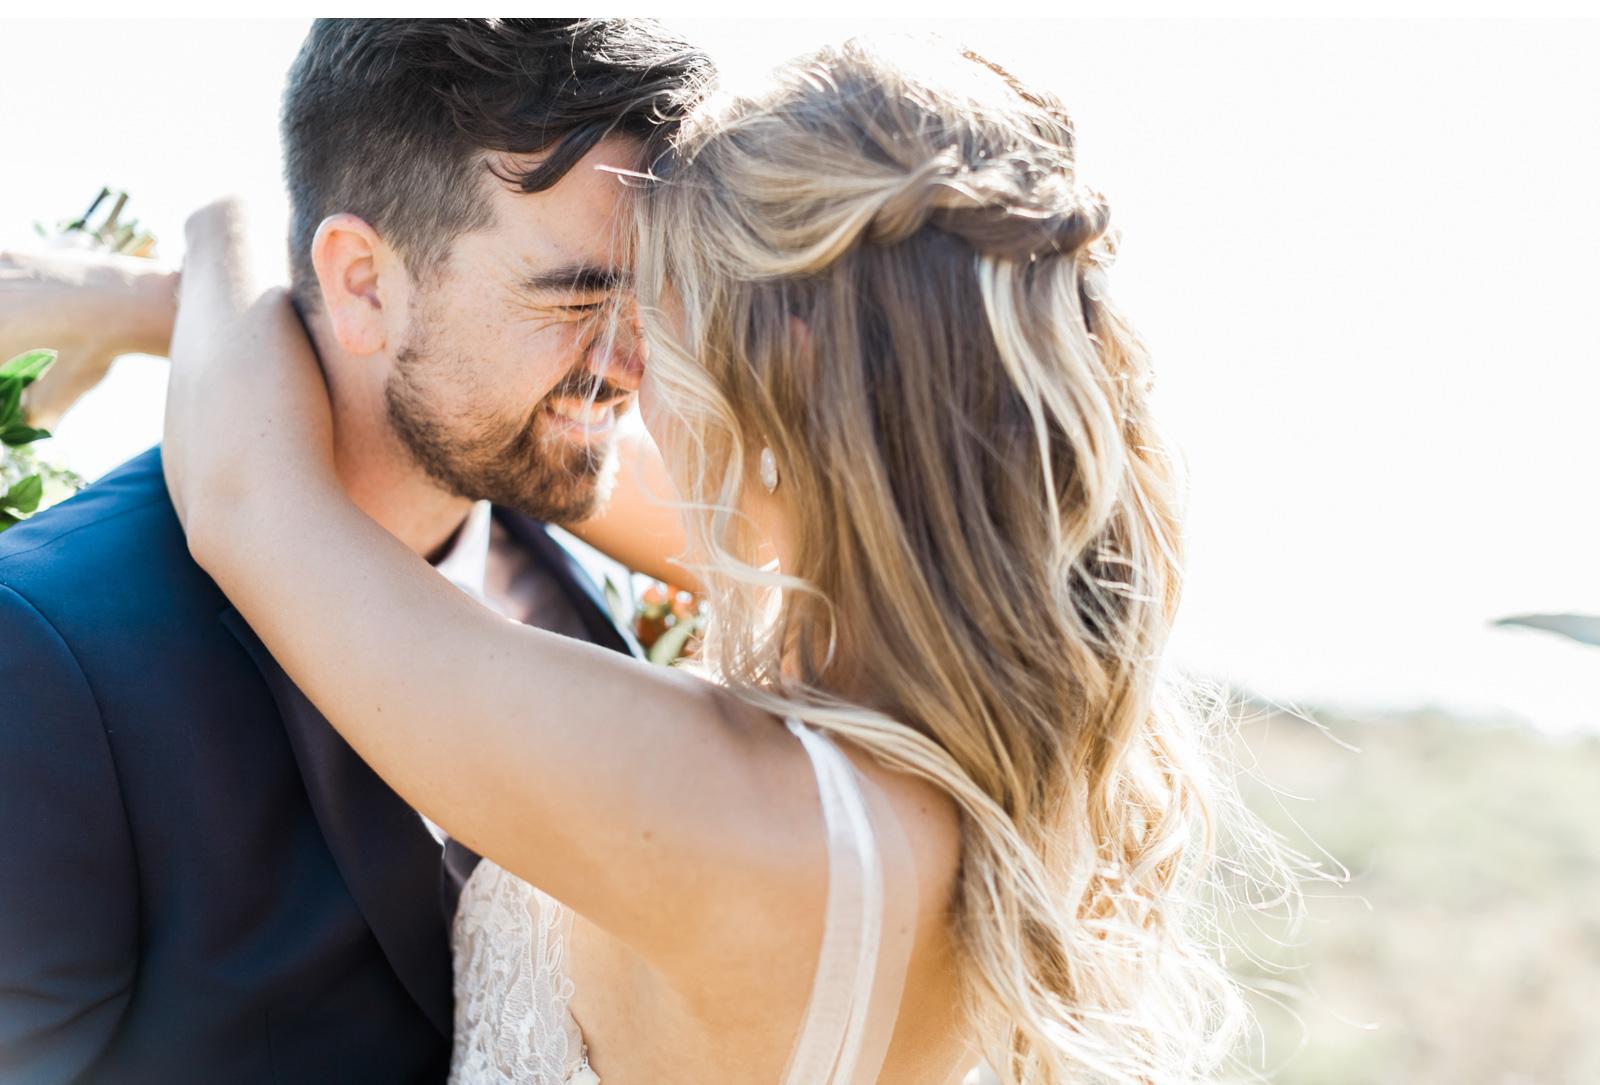 Style-Me-Pretty-San-Luis-Obispo-Wedding-Natalie-Schutt-Photography_08.jpg